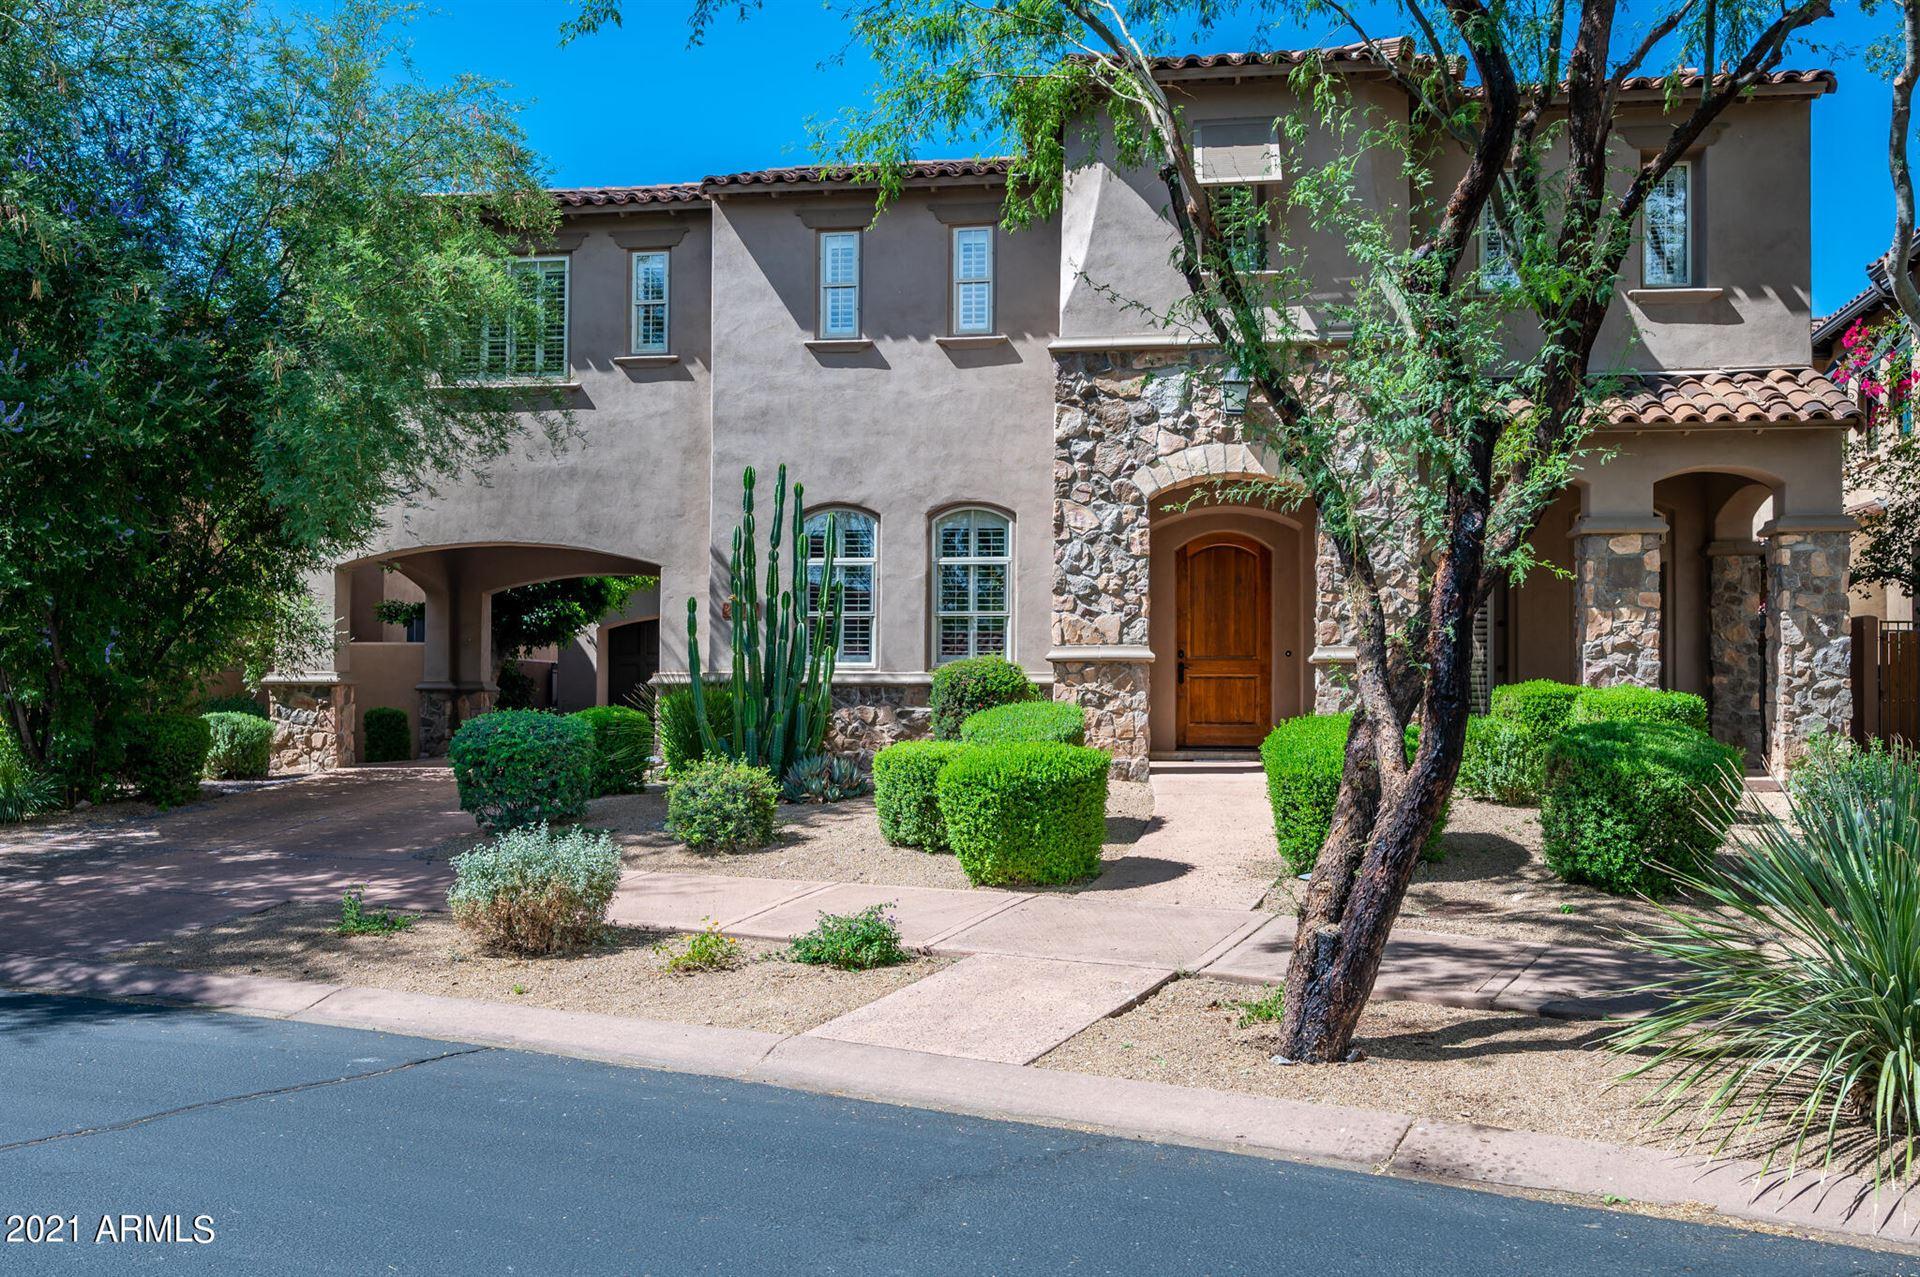 Photo of 20469 N 93RD Place, Scottsdale, AZ 85255 (MLS # 6252234)